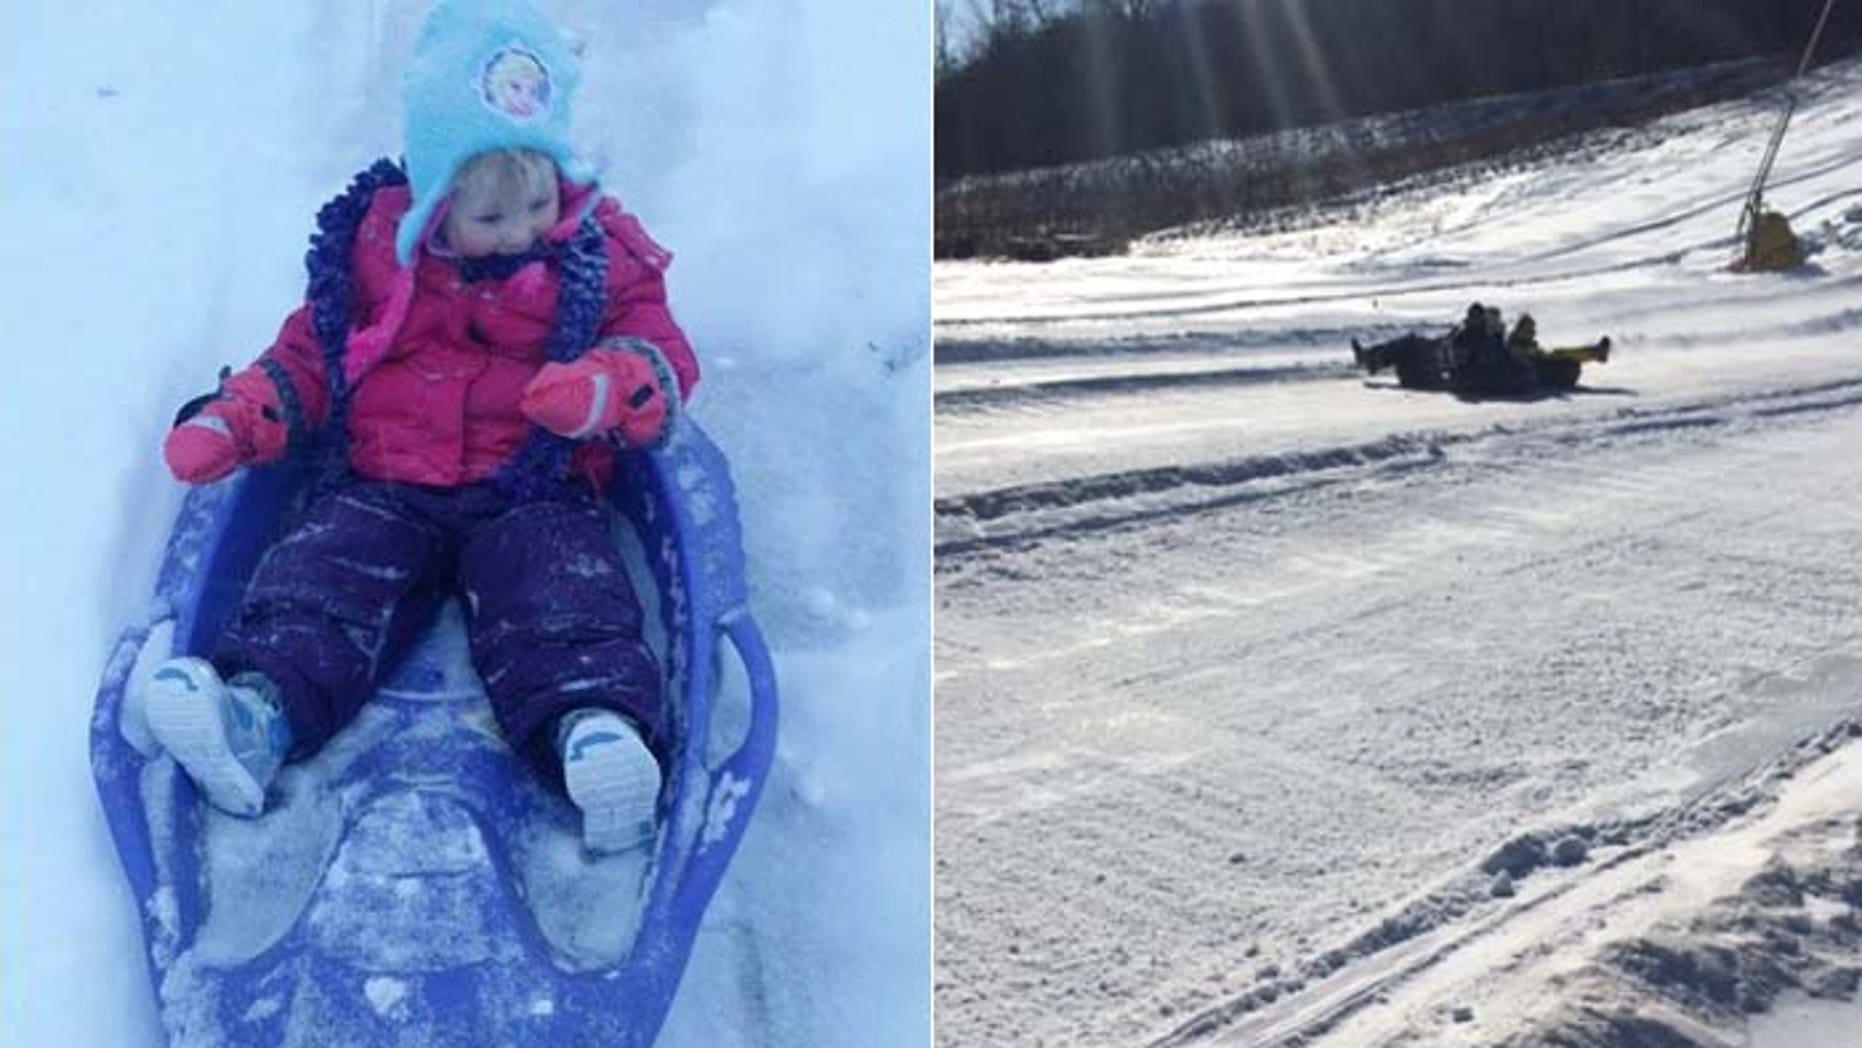 Kids in Dubuque, Iowa, like Ava Van Walbeek, 2, won't be sledding on public property under a new ordinance. (Courtesy: Micole Van Walbeek, Natasha Sayles)